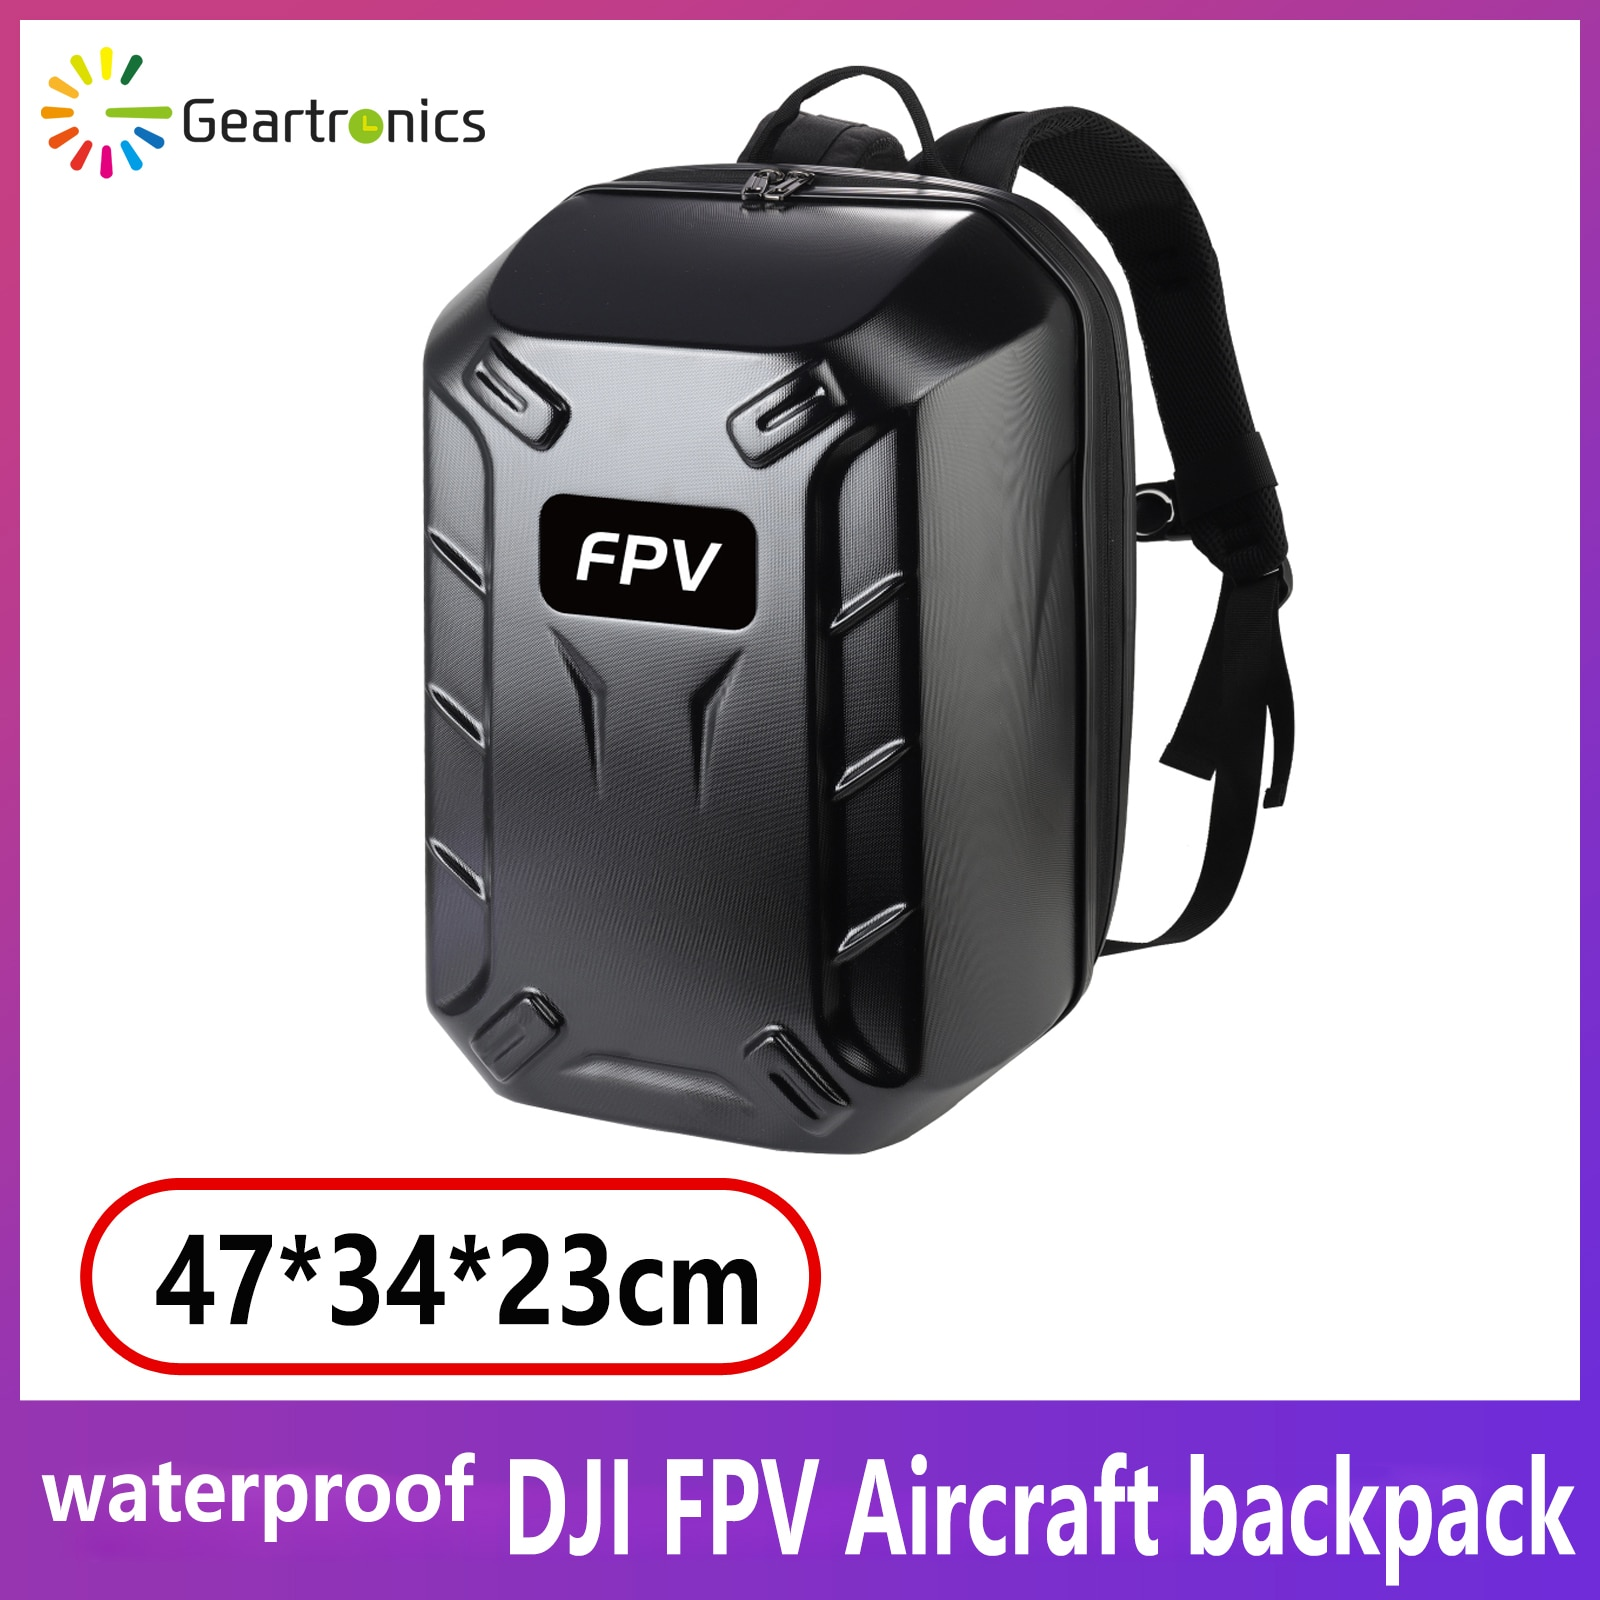 DJI FPV معبأة مع حقيبة الظهر-Crosser حقيبة كتف مزدوجة FPV نظارات V2 اكسسوارات حزمة الطائرة بدون طيار حقائب 1.78 كجم